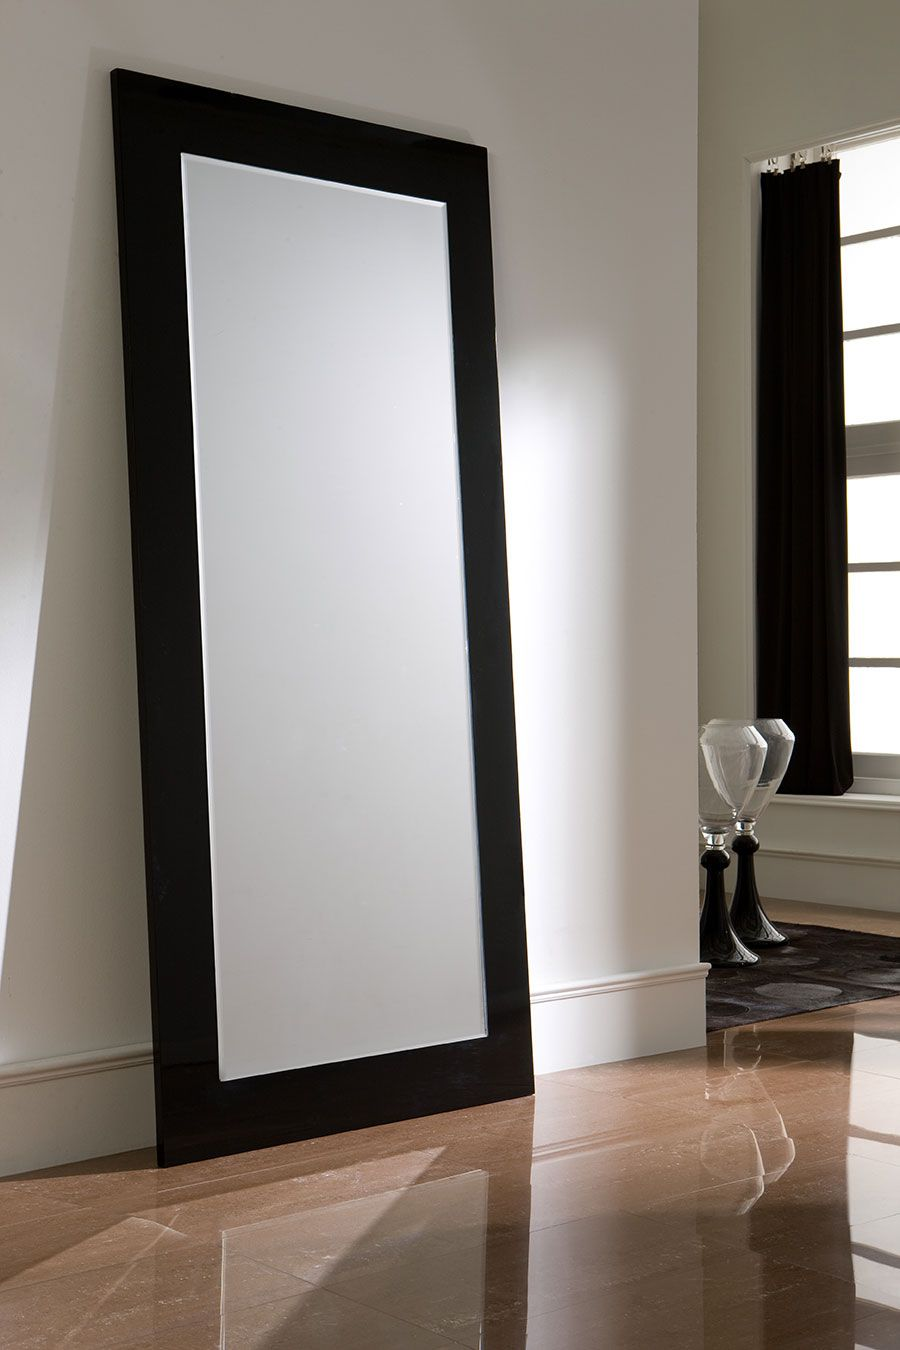 impressionnant miroir long pas cher d coration fran aise miroir grand miroir miroir mural. Black Bedroom Furniture Sets. Home Design Ideas